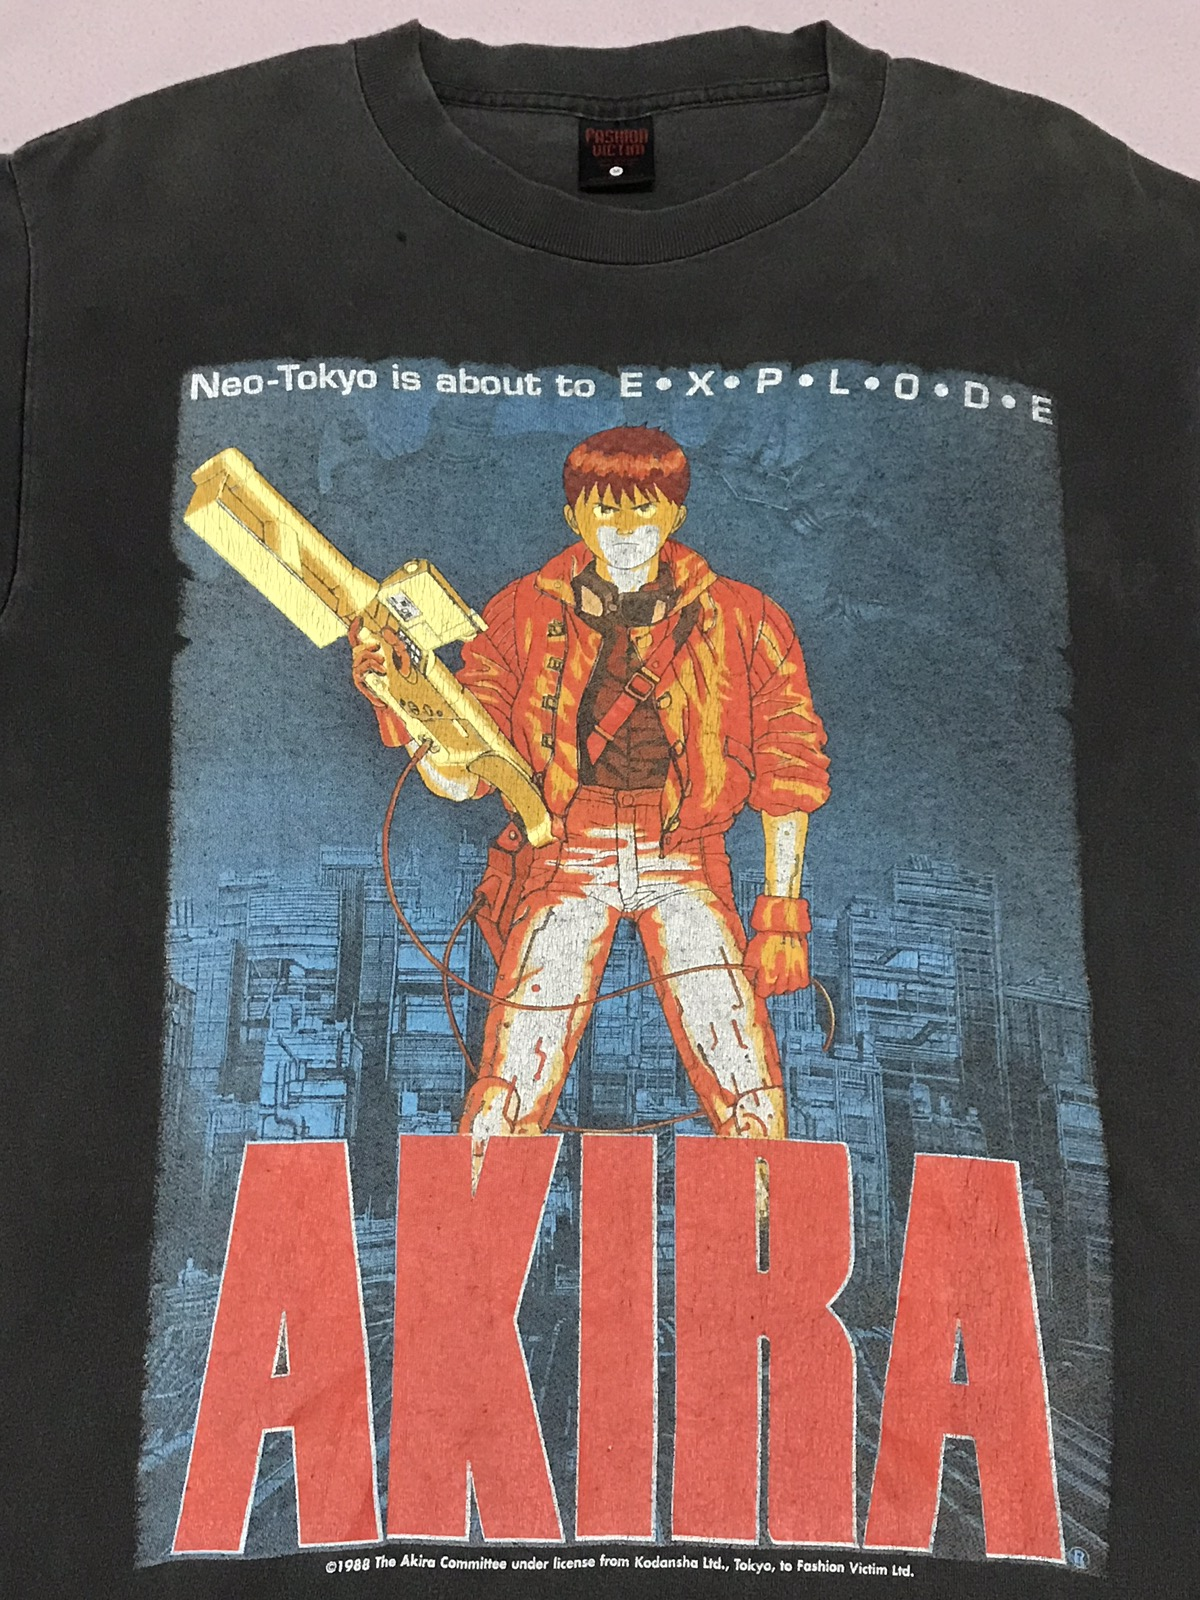 Vintage Very Rare Vintage Akira Fashion Victim Anime Manga Tshirt Ghost In The Shell Supreme Issey Miyake Hypebeast Cowboy Bebop Samurai Champloo Bathing Ape Grailed